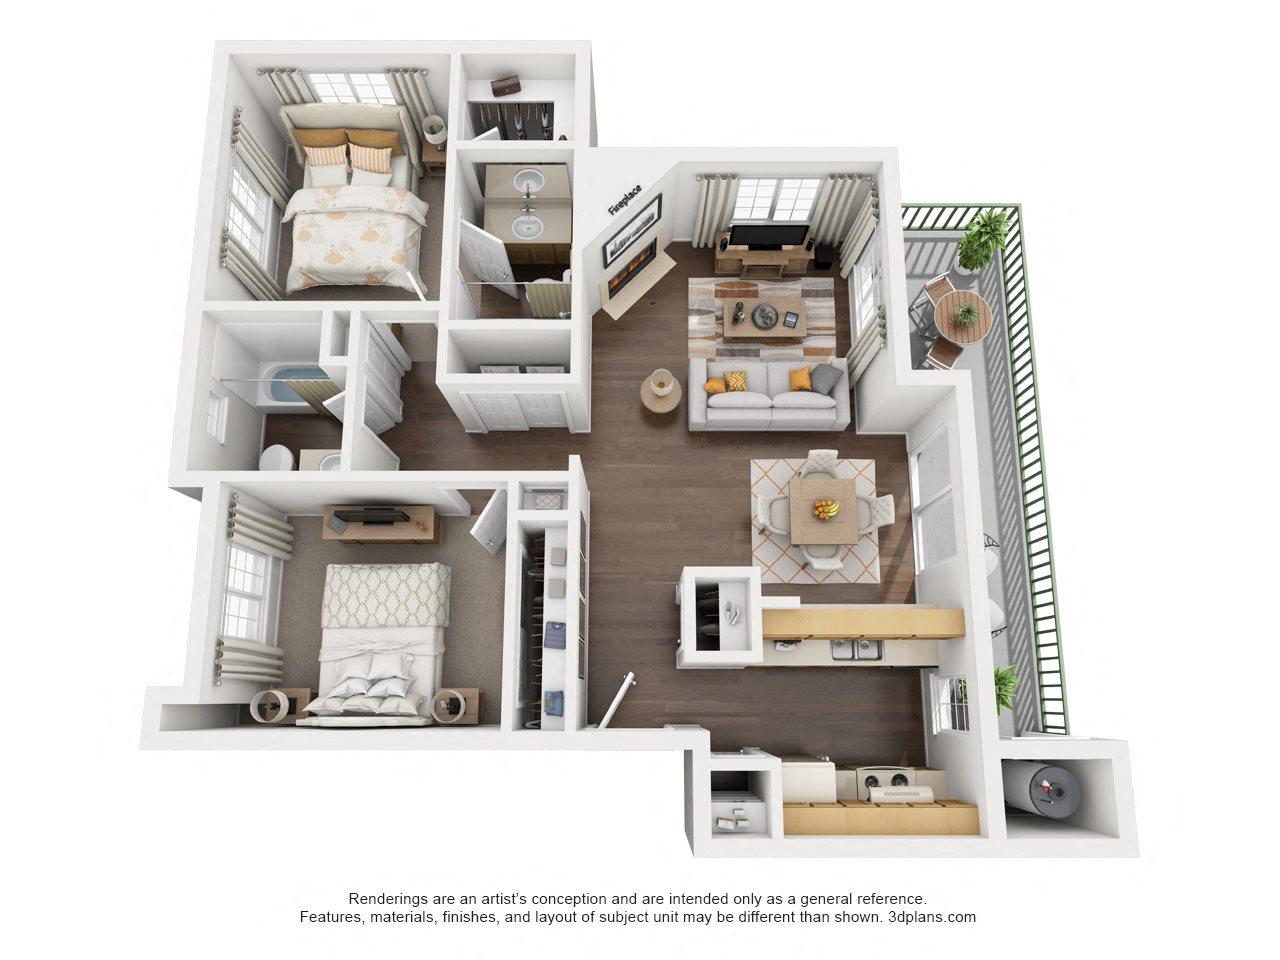 2 Bedroom, 2 Bath, Upstairs Floor Plan 6